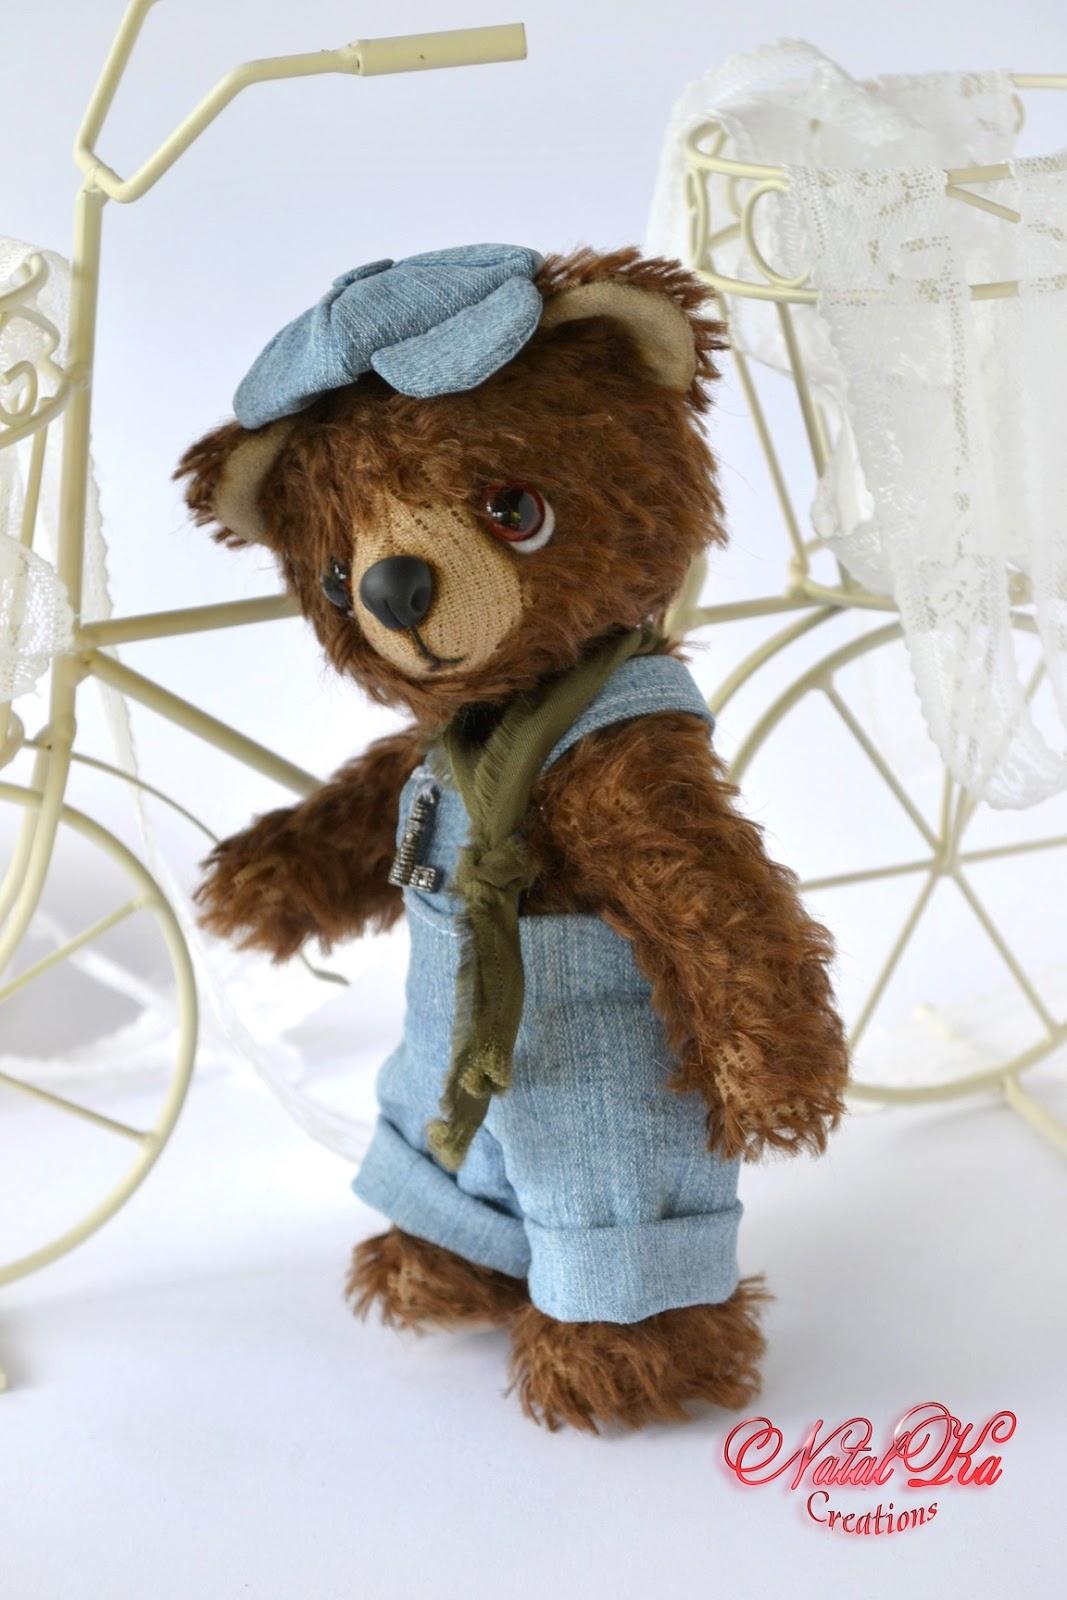 Künstlerteddybär handgemacht von NatalKa Creations. Artist teddy bear handmade by Natalka Creations